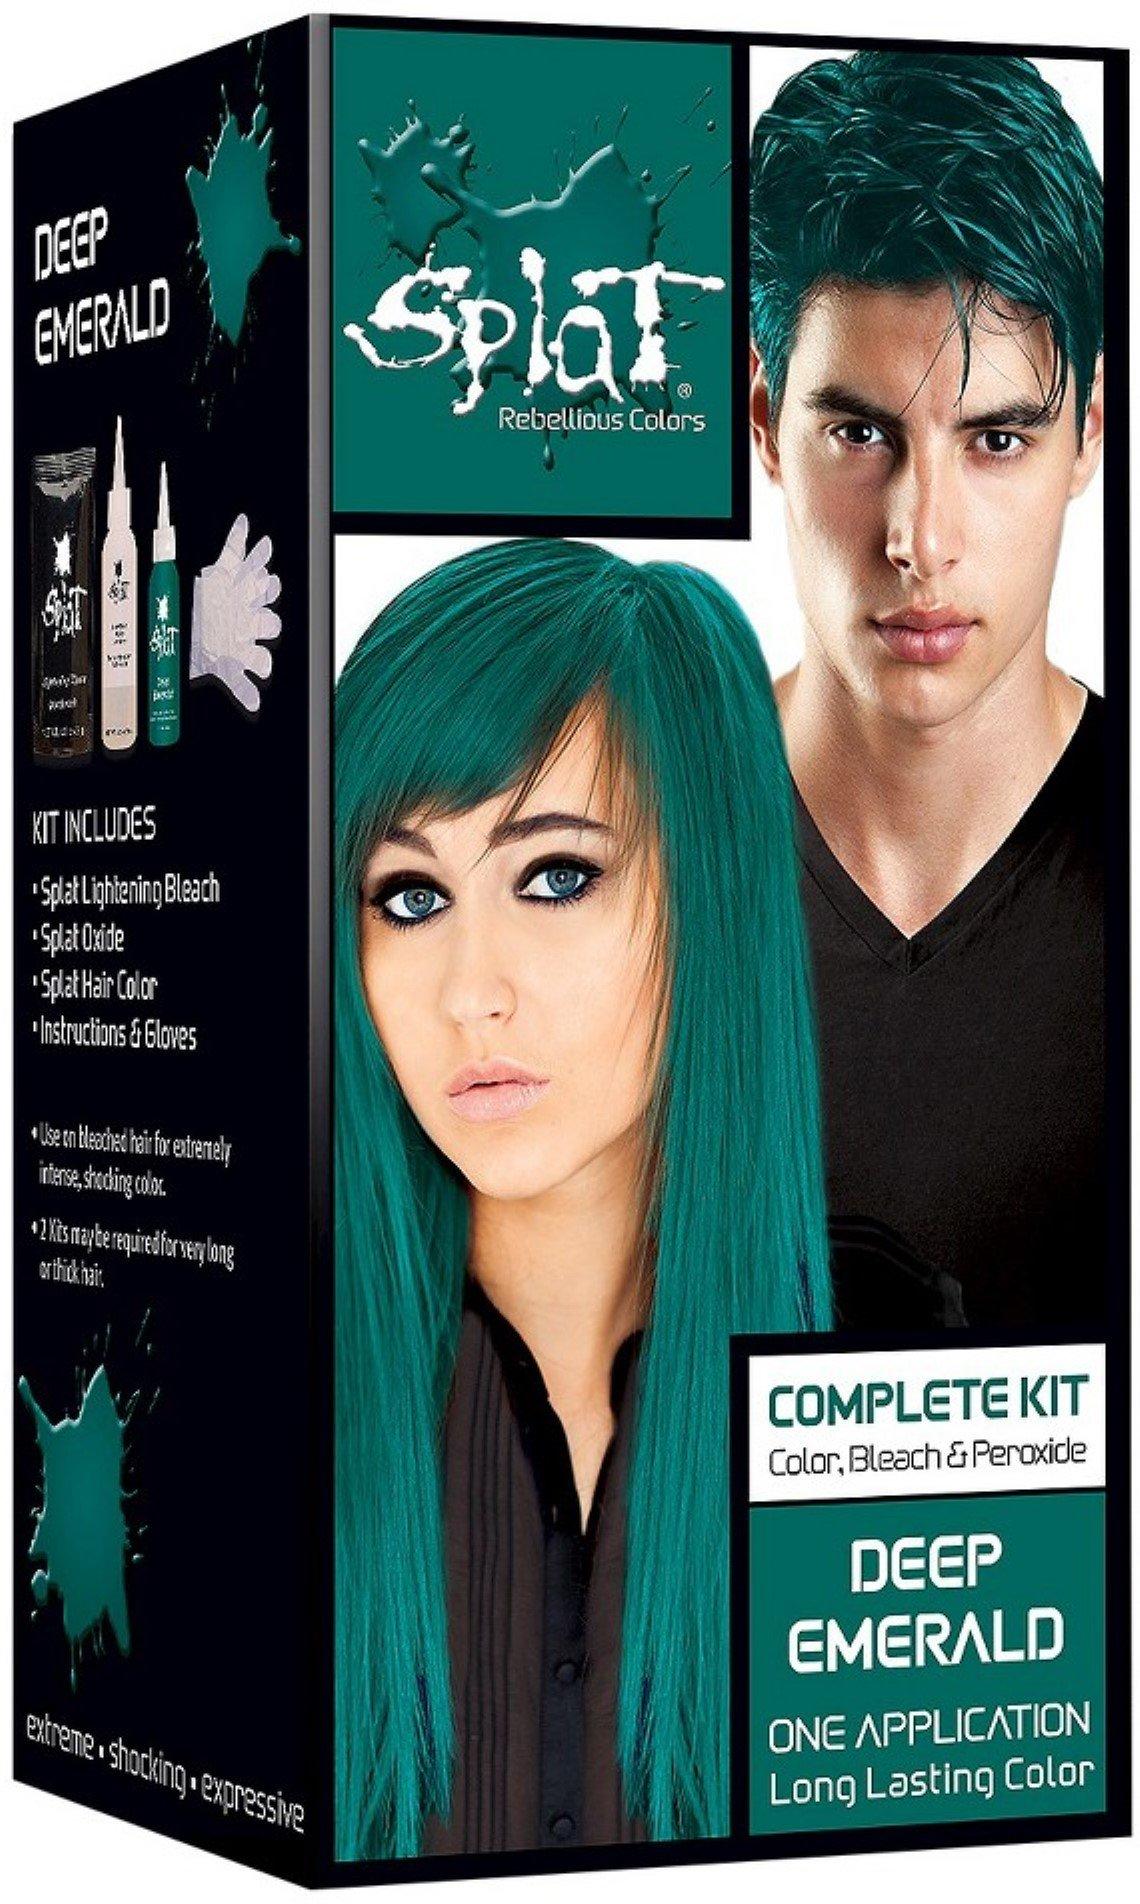 Splat Rebellious Colors Hair Coloring Complete Kit, Deep Emerald 1 ea (Pack of 2) by Splat